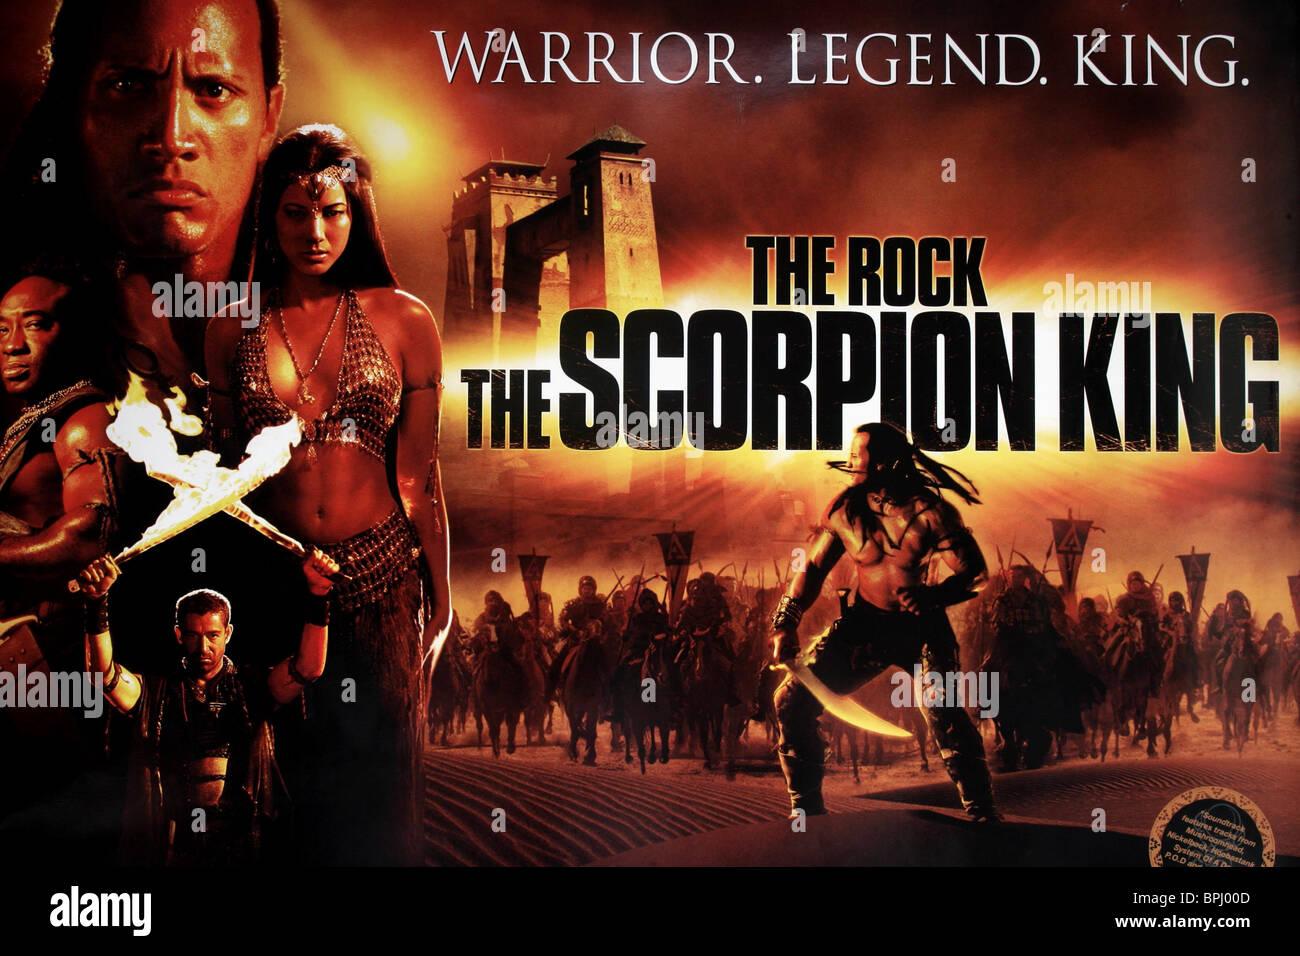 The Scorpion King Movies